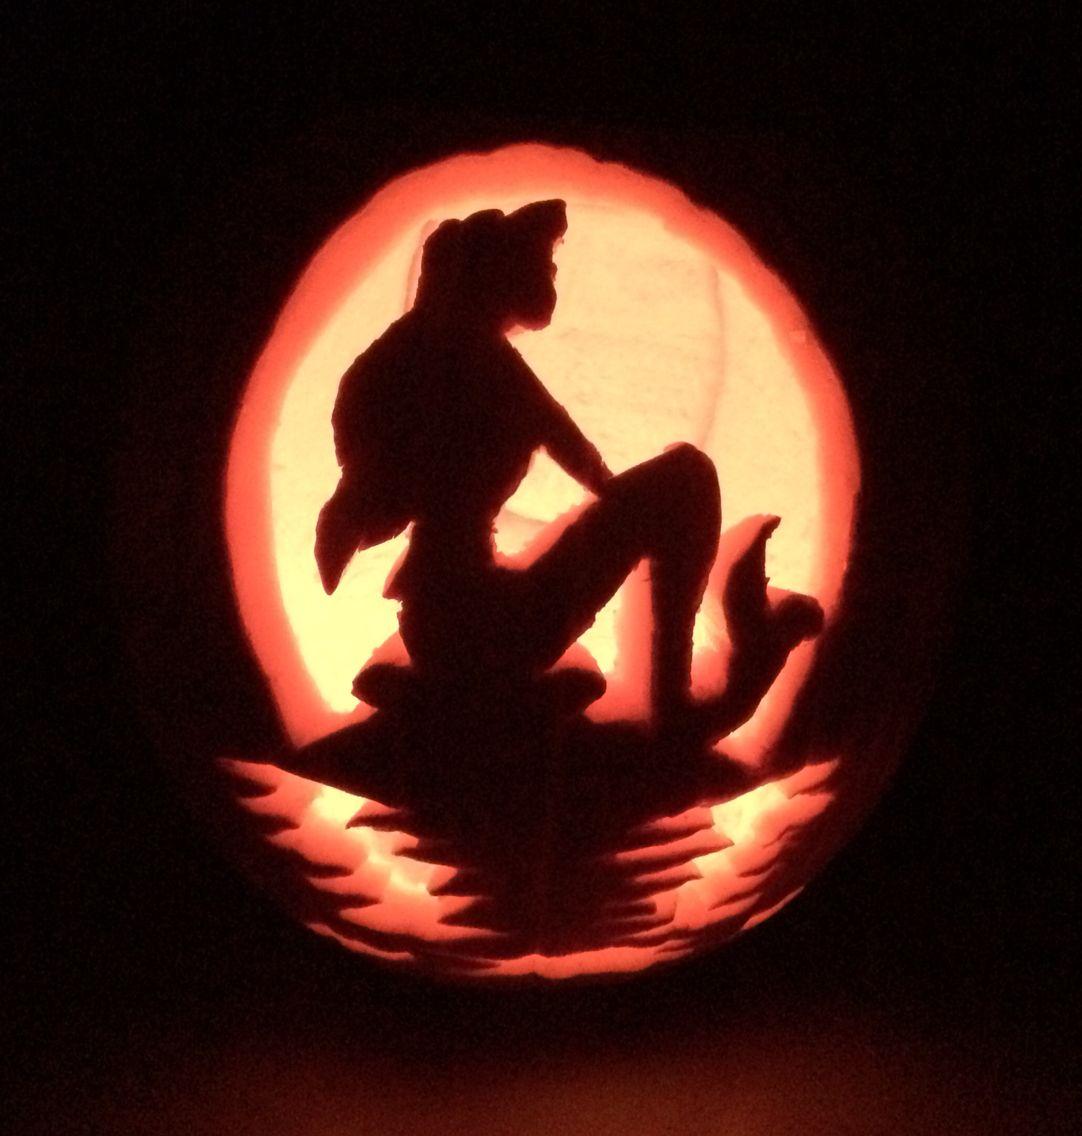 My Ariel Little Mermaid Disney Pumpkin Carving Project Such An